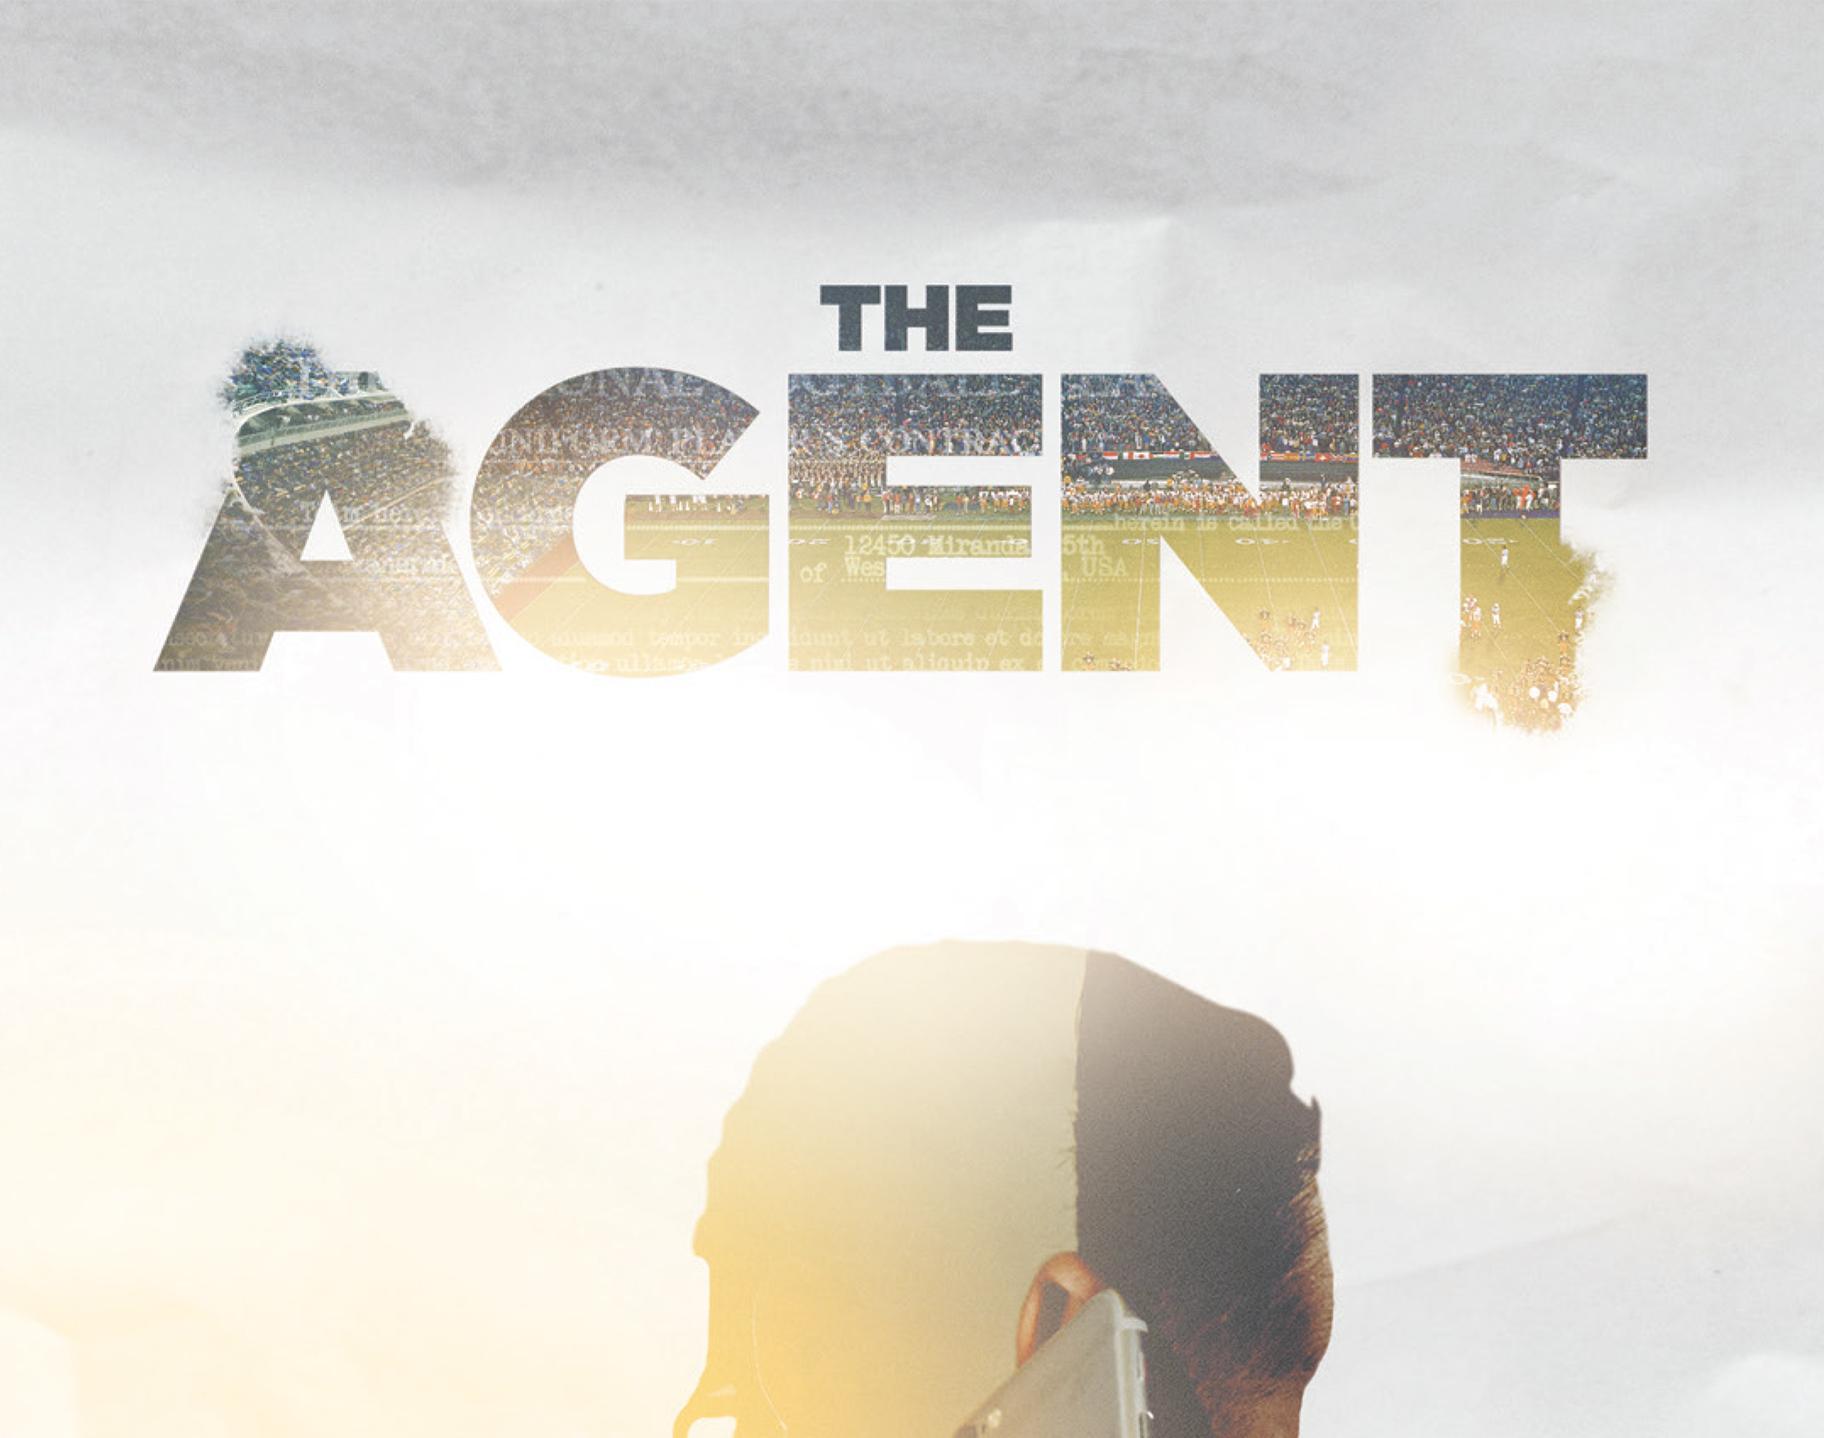 THE_AGENT_SEASON_1_SINGLE_PAGE.jpg